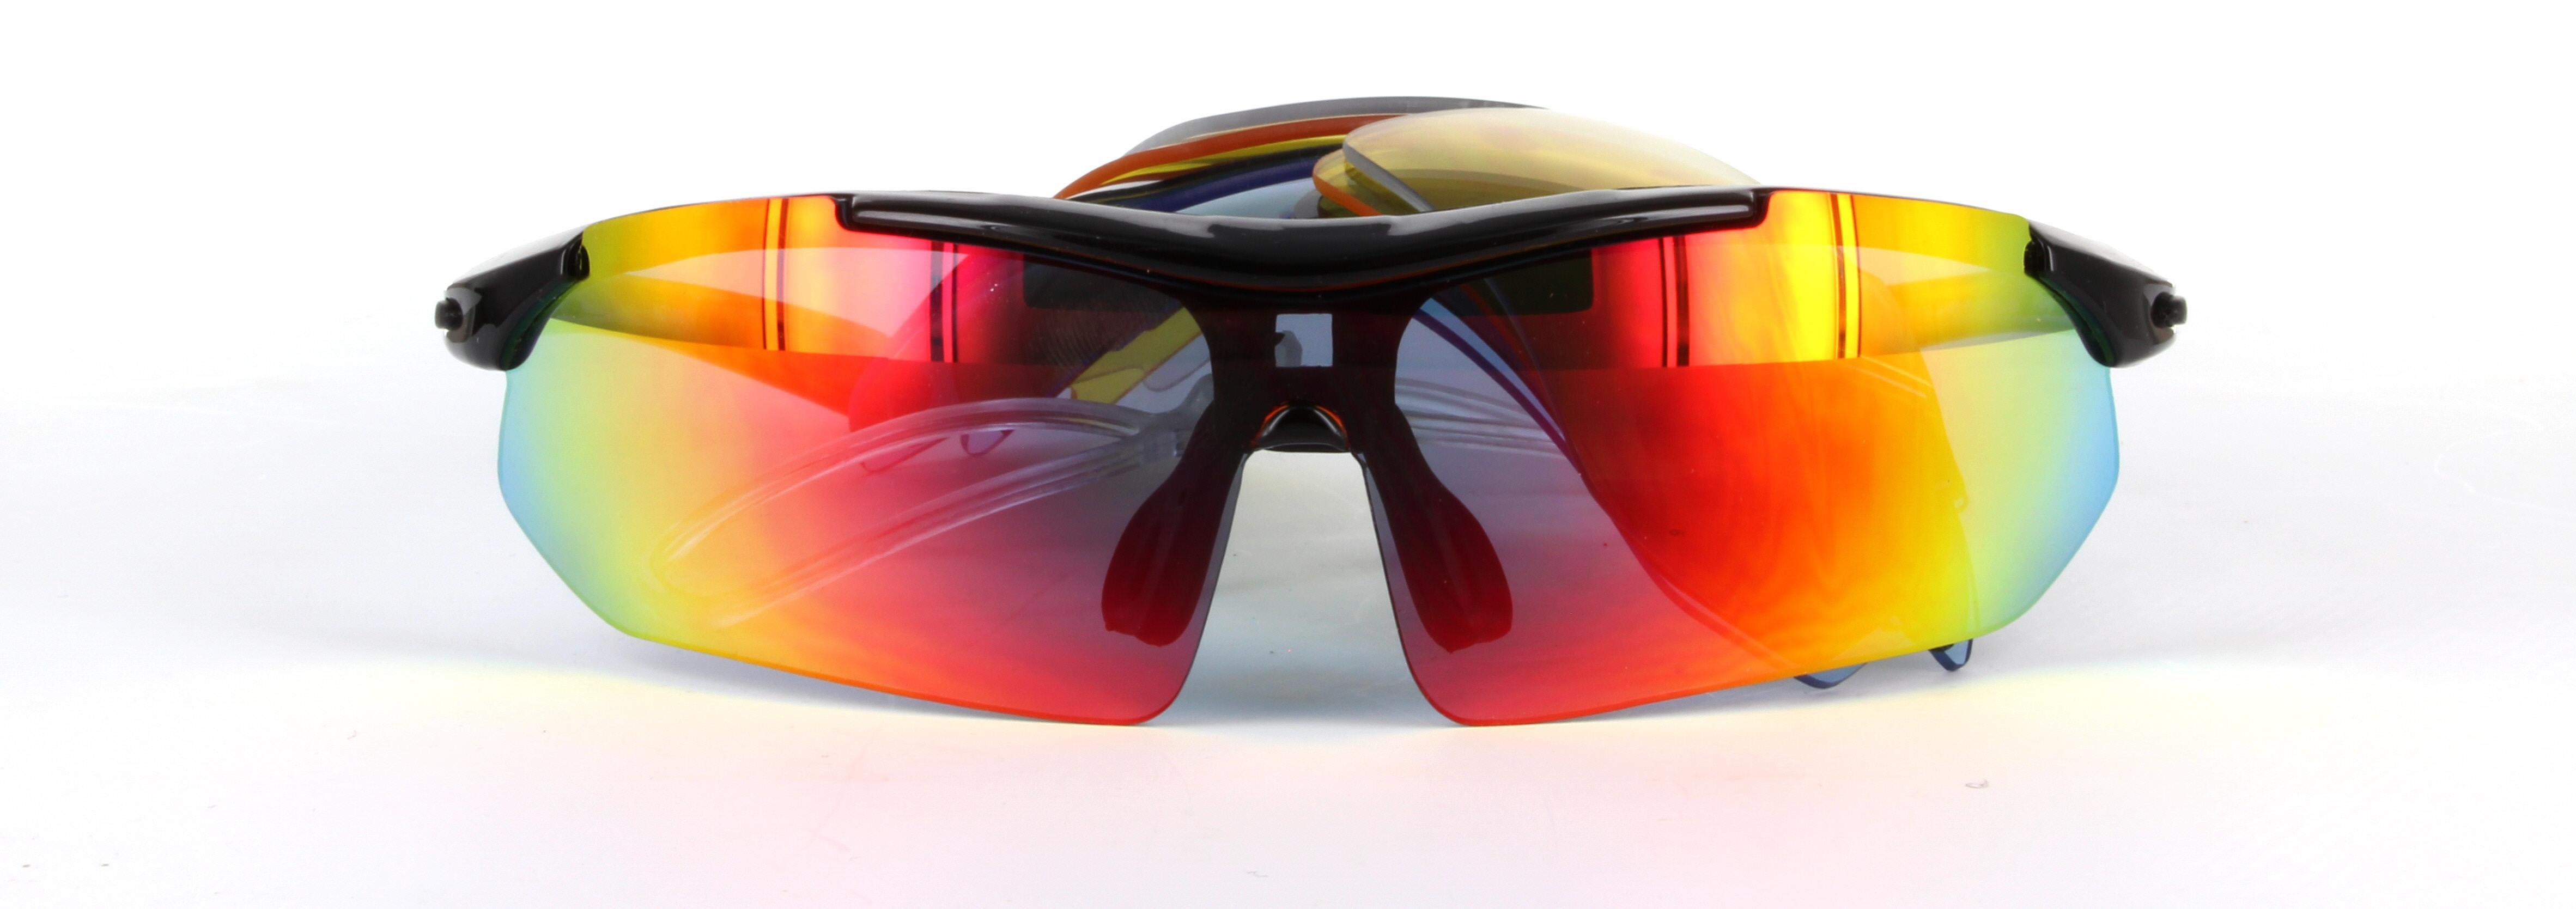 64ced31dcd6 IG619 Black   Red - Sports Sunglasses